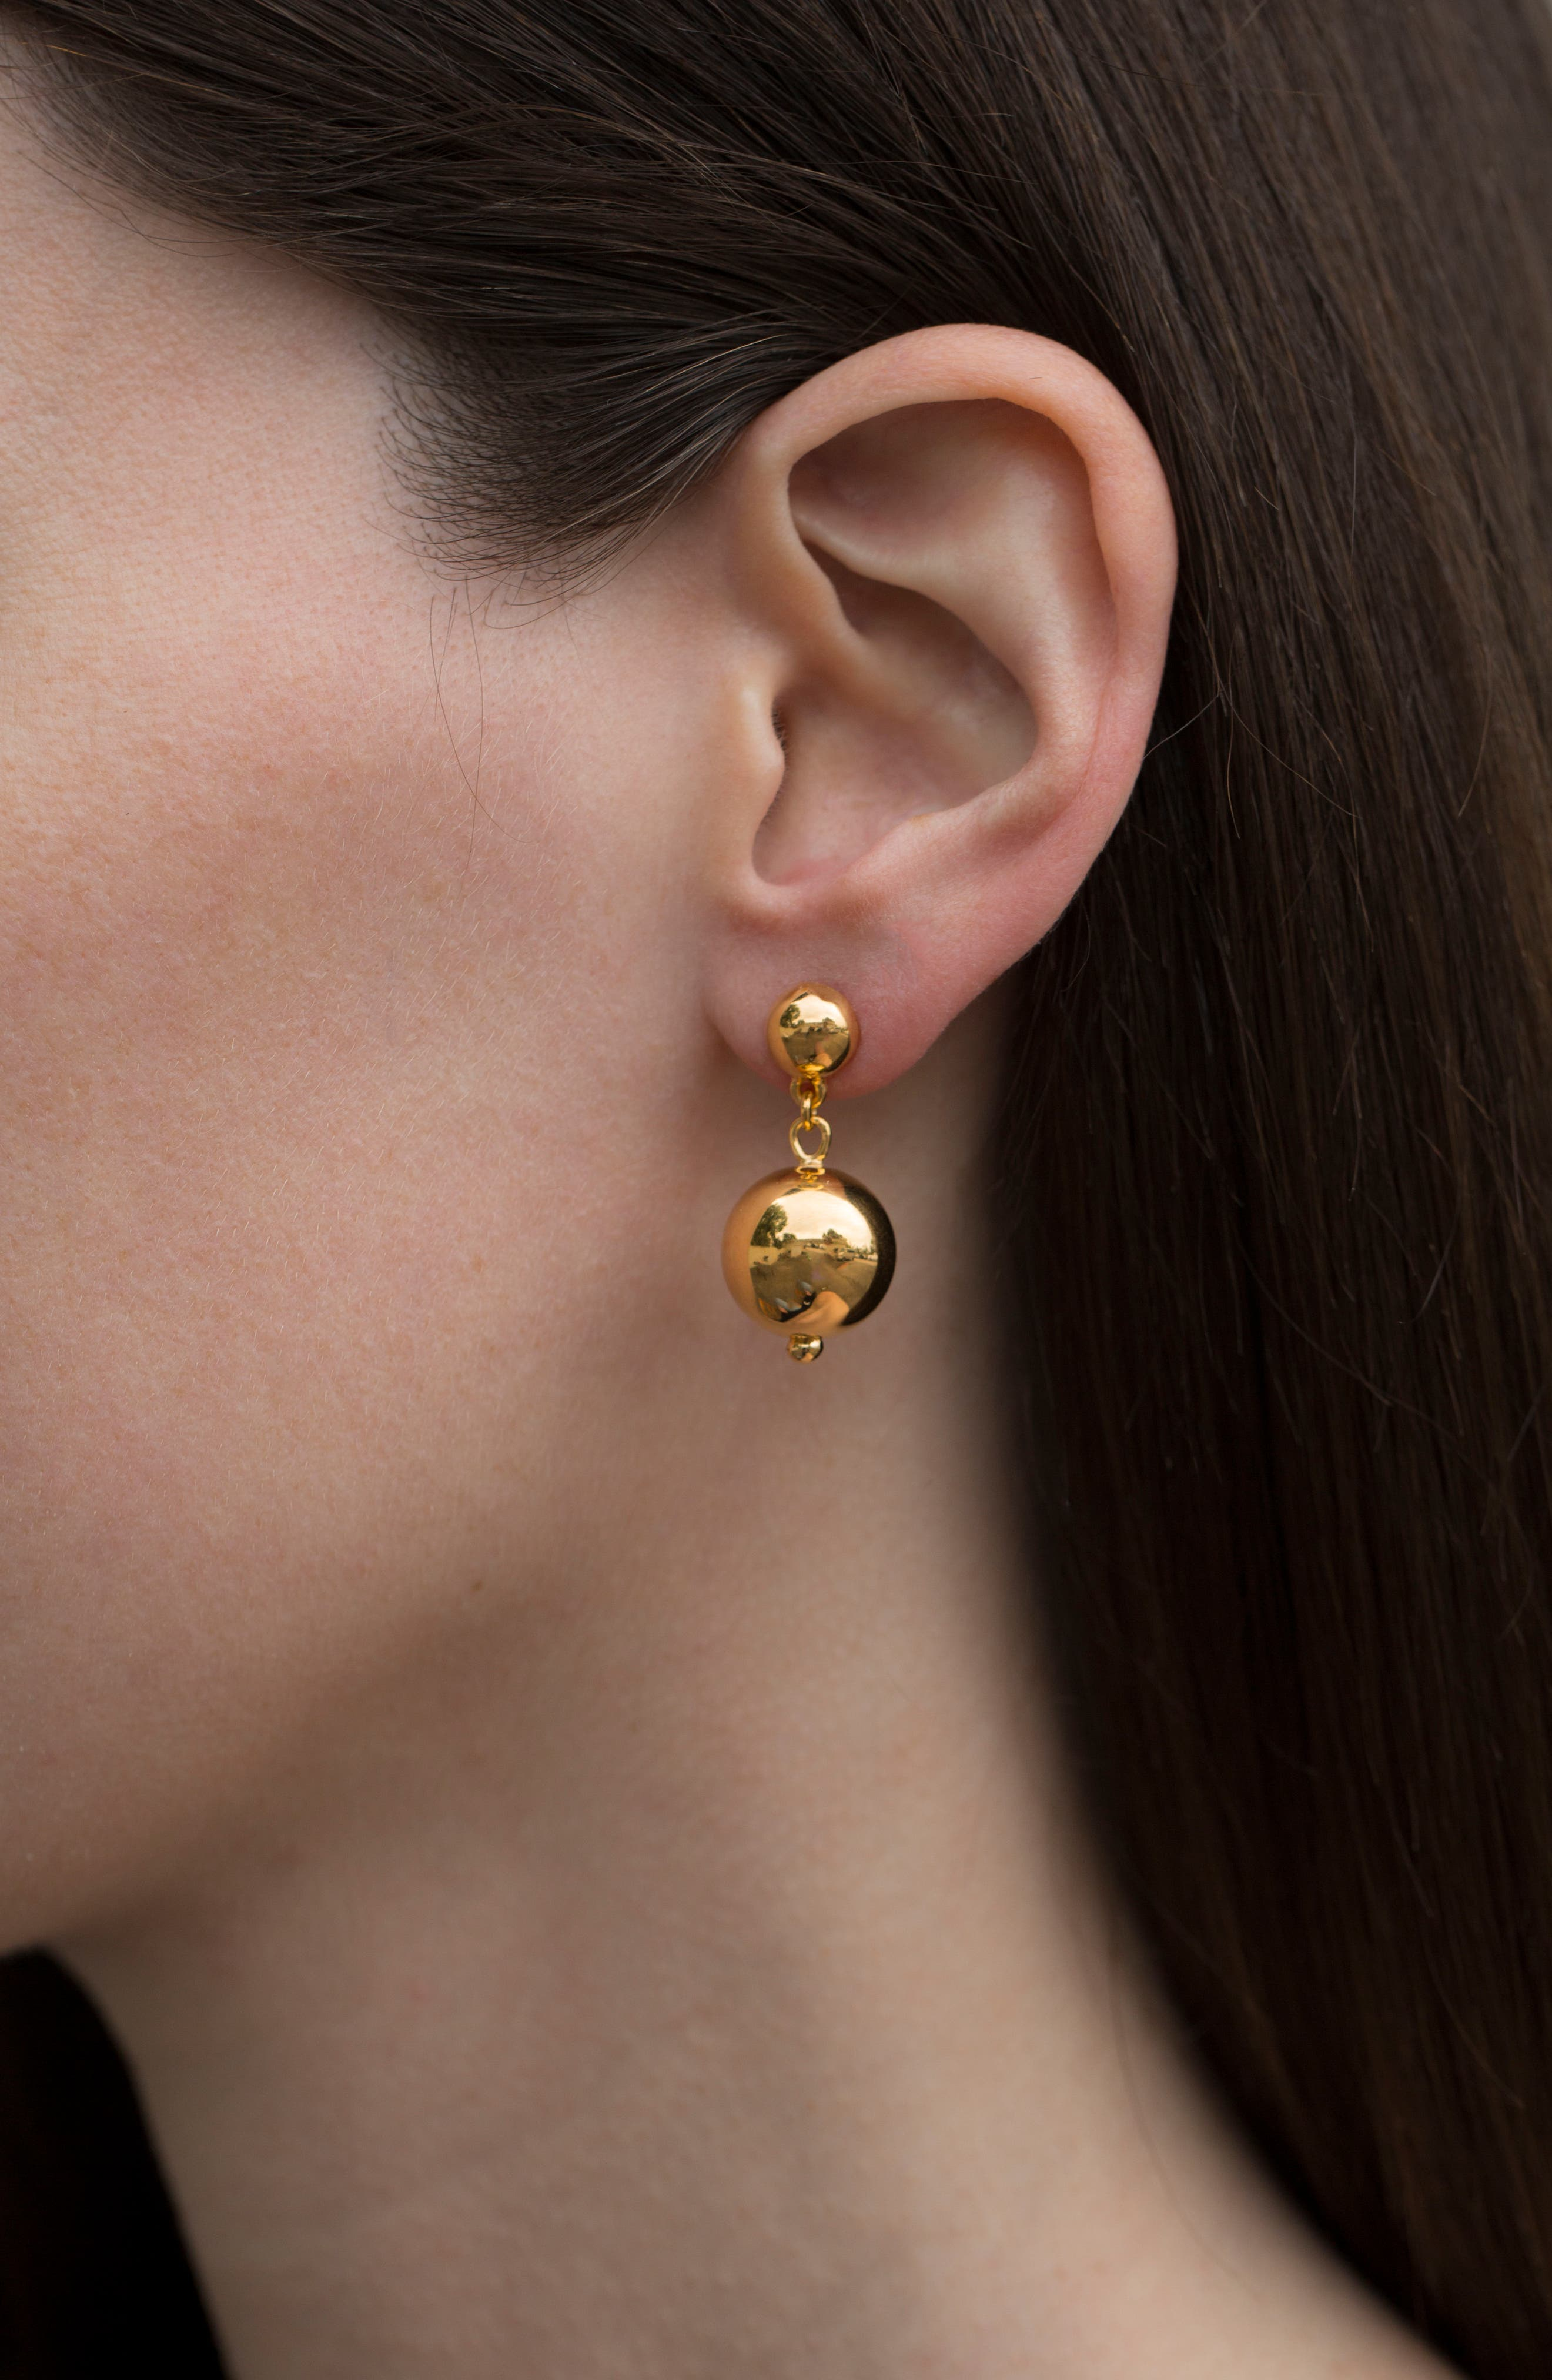 Vermeil Ball Drop Earrings,                             Alternate thumbnail 3, color,                             GOLD